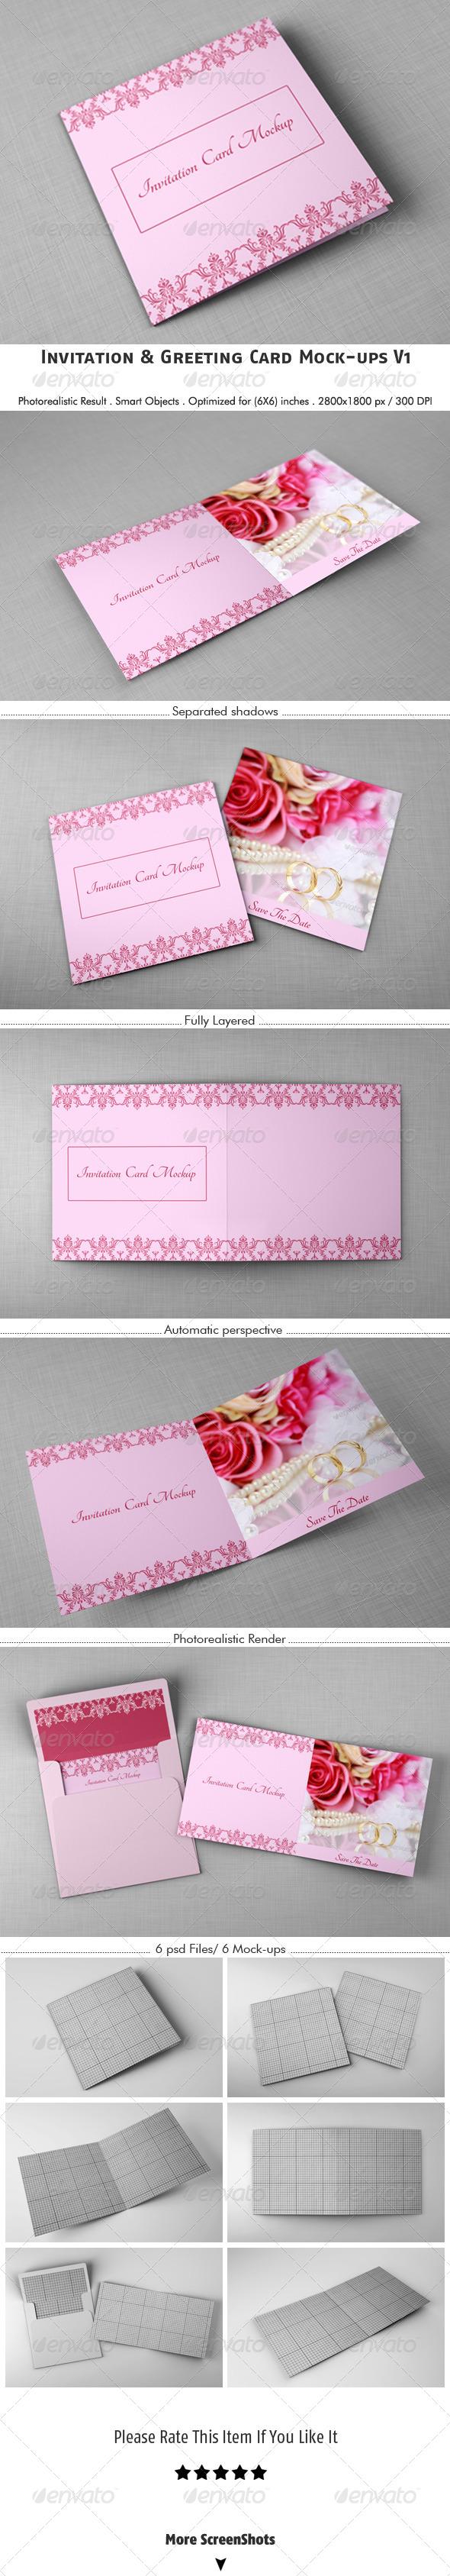 Invitation & Greeting Card Mockups V1